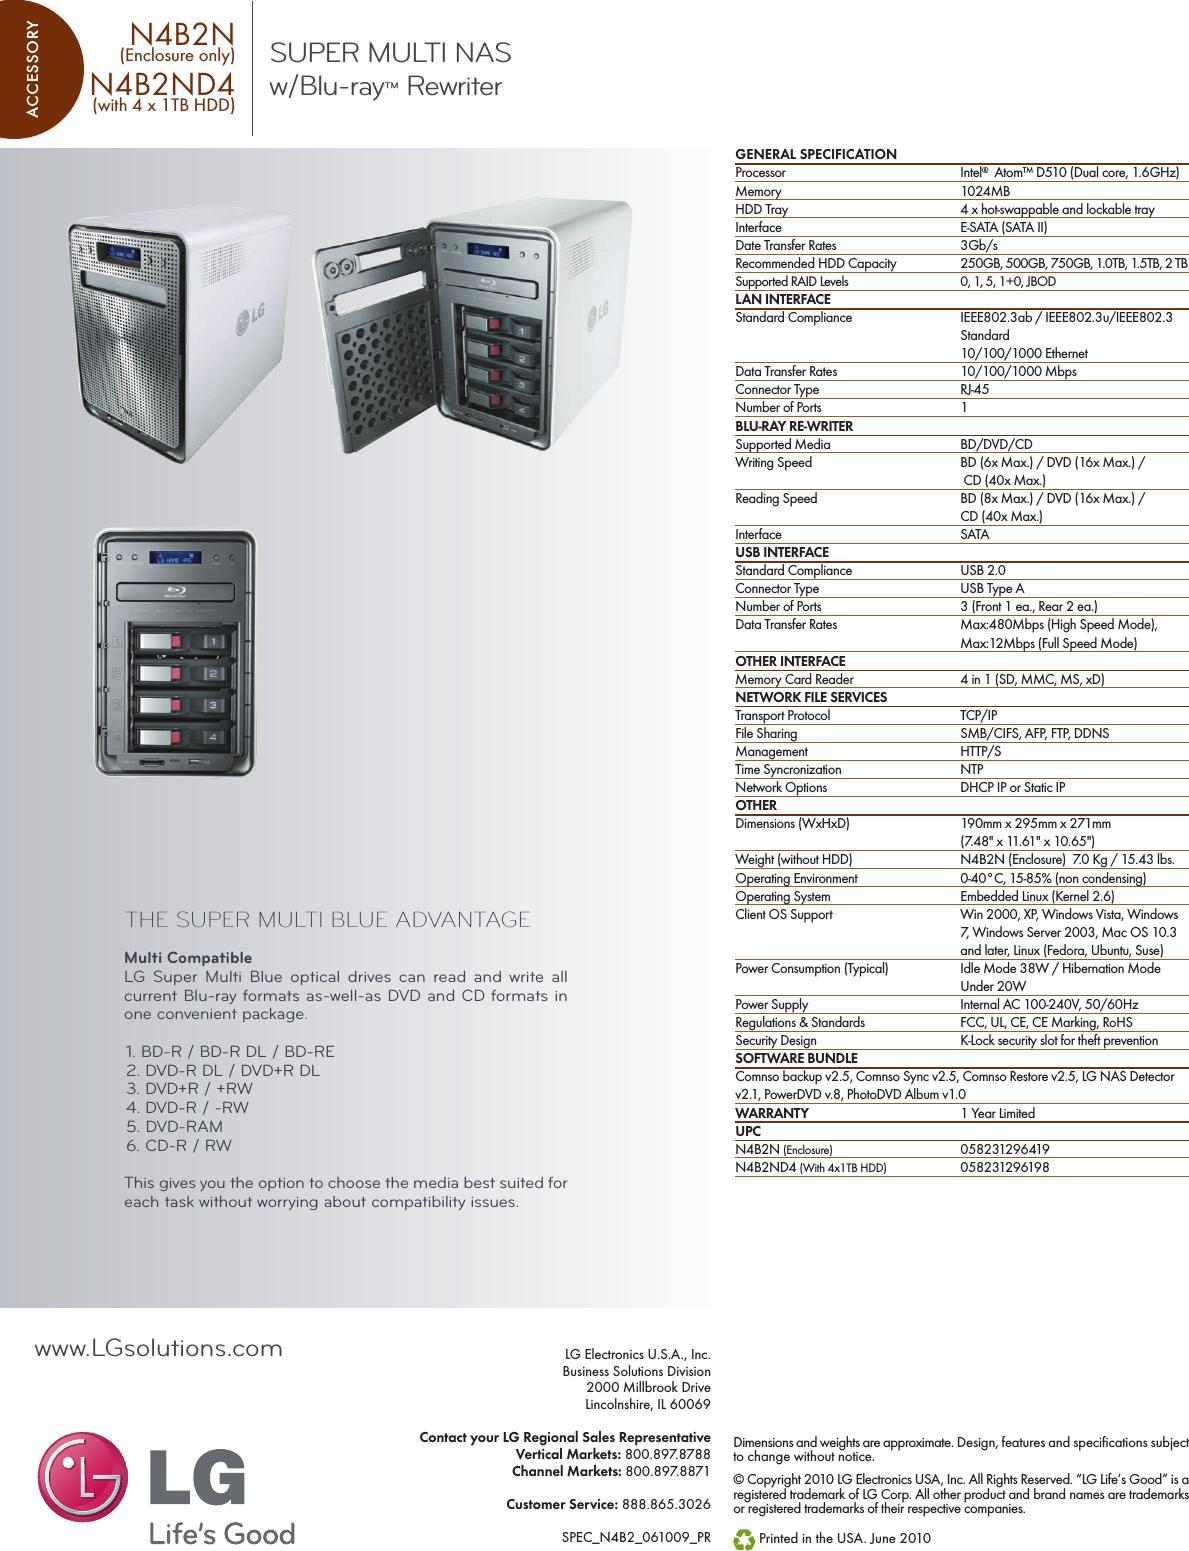 lg n4b2nd4 user manual specification network storage n4b2n spec sheet usermanual wiki